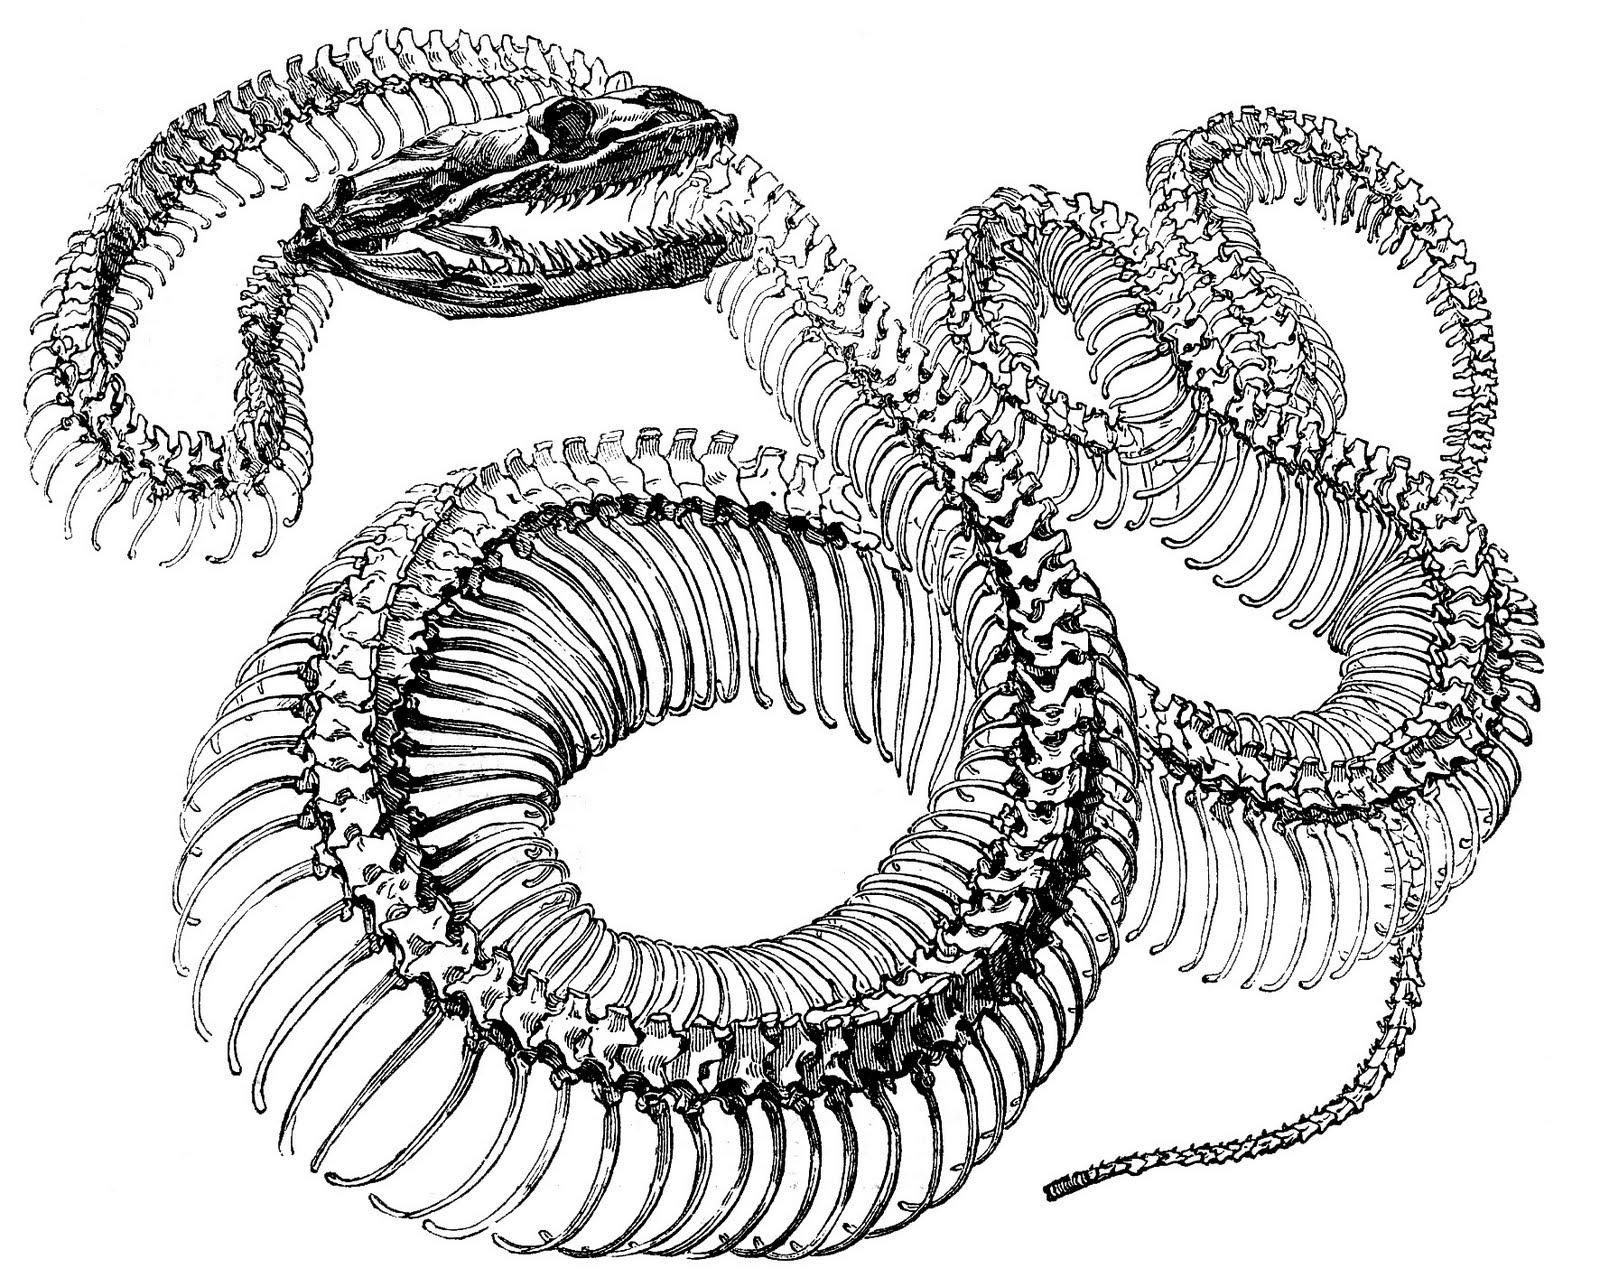 Drawn snake vintage Antique Skeleton  Snake fairy